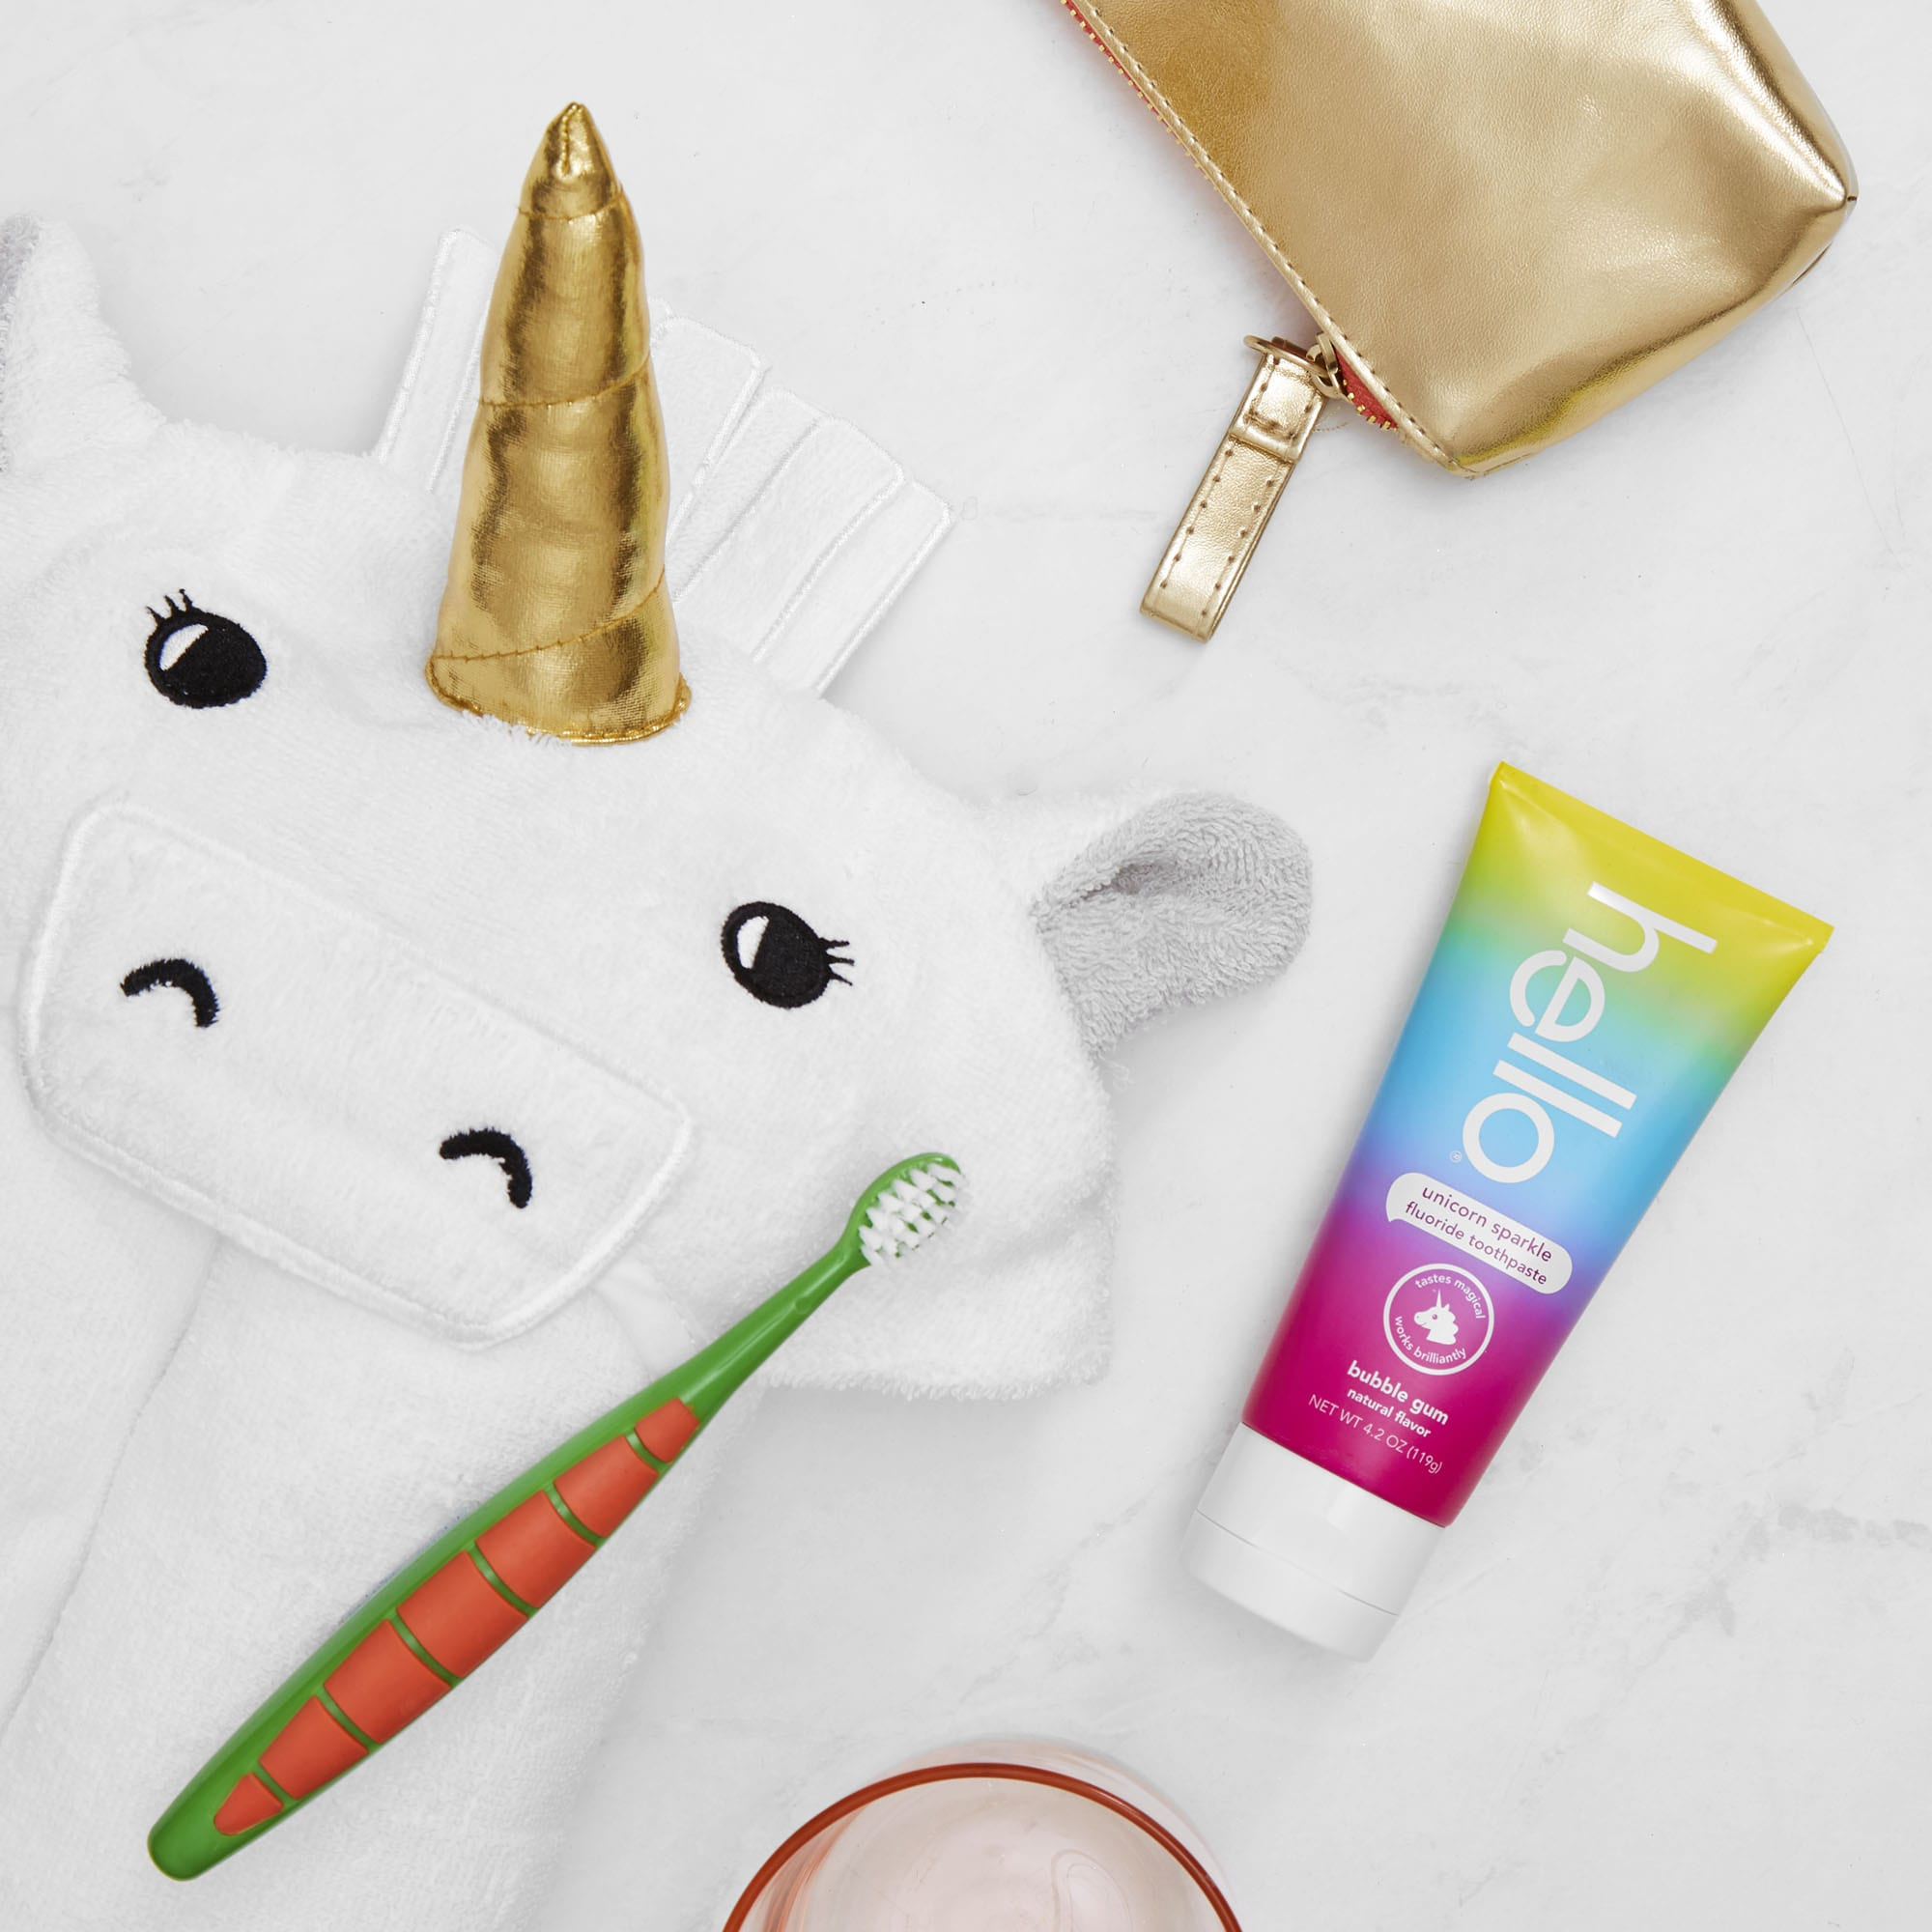 Unicorn Sparkle toothpaste